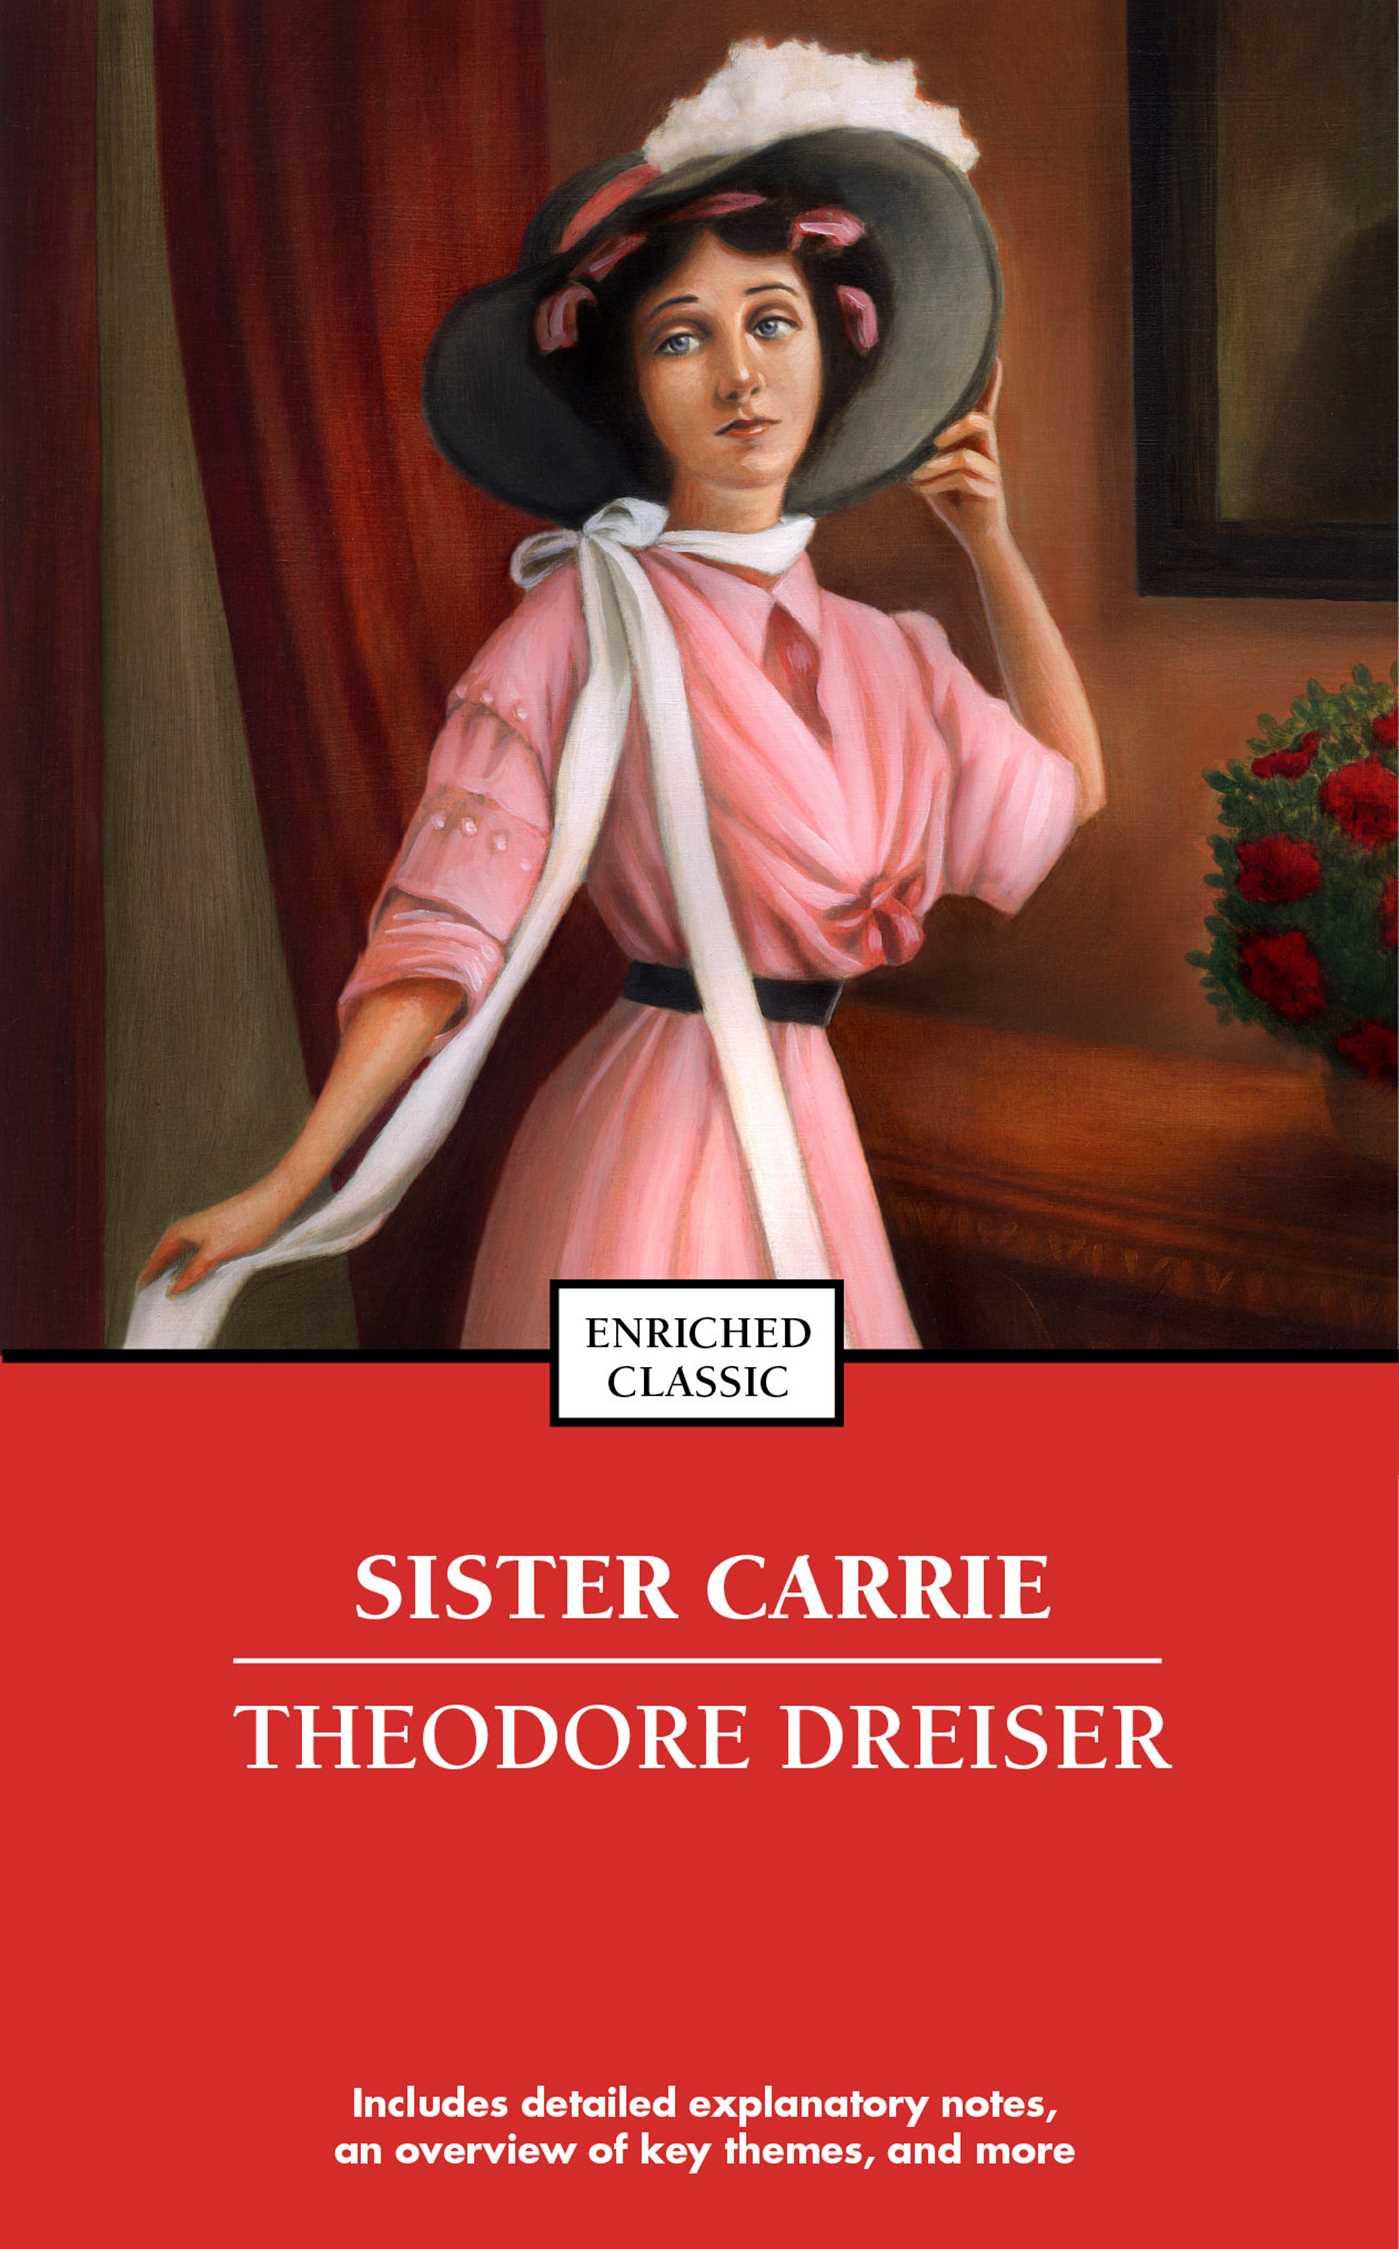 Sister carrie 9781451686319 hr